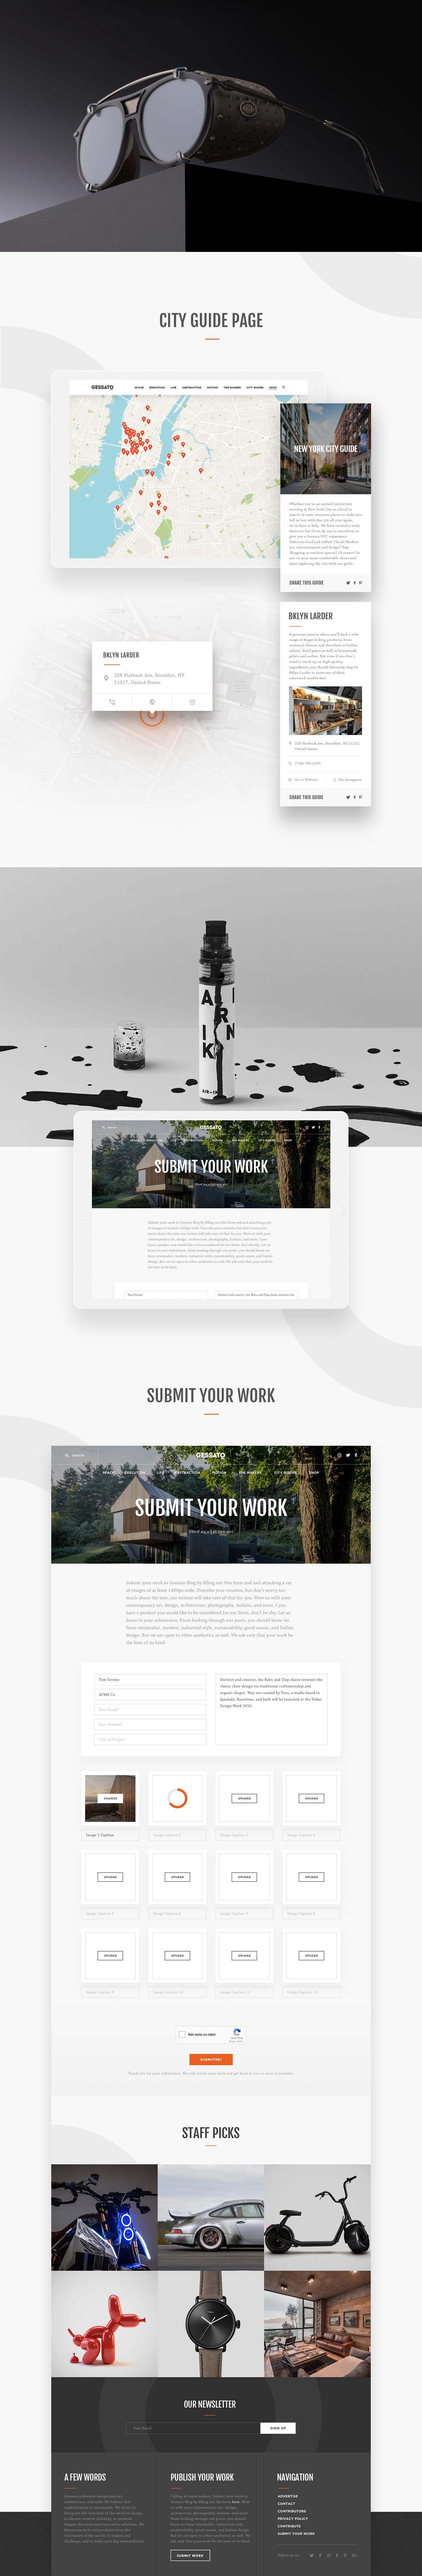 Website Freelance Blog magazine company architecture decor furniture Interior interior design